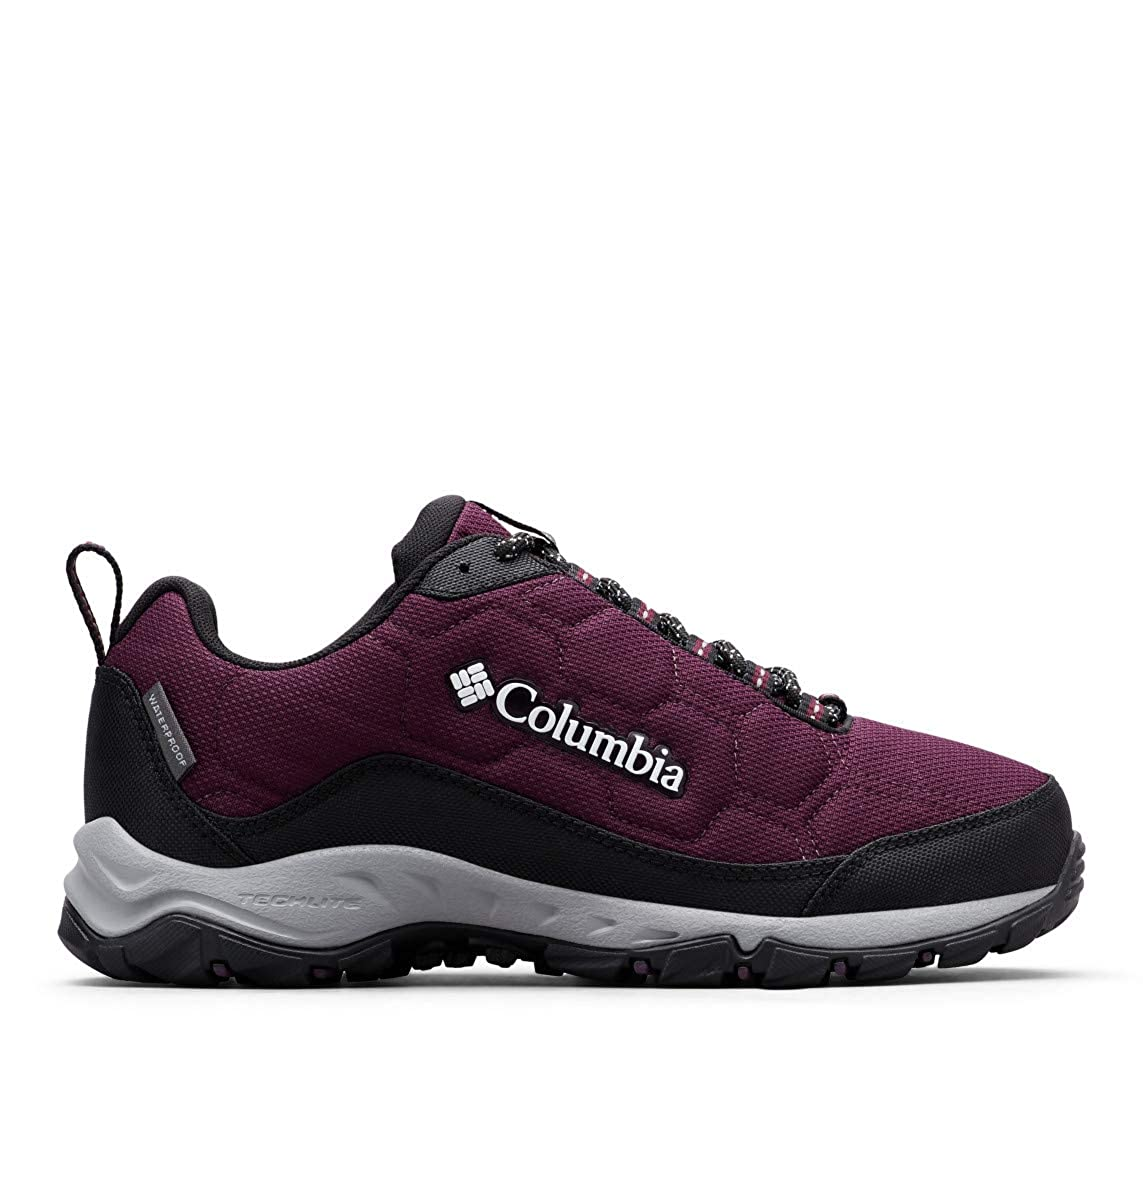 Waterproof /& Breathable Columbia Women/'s Firecamp Hiking Shoe